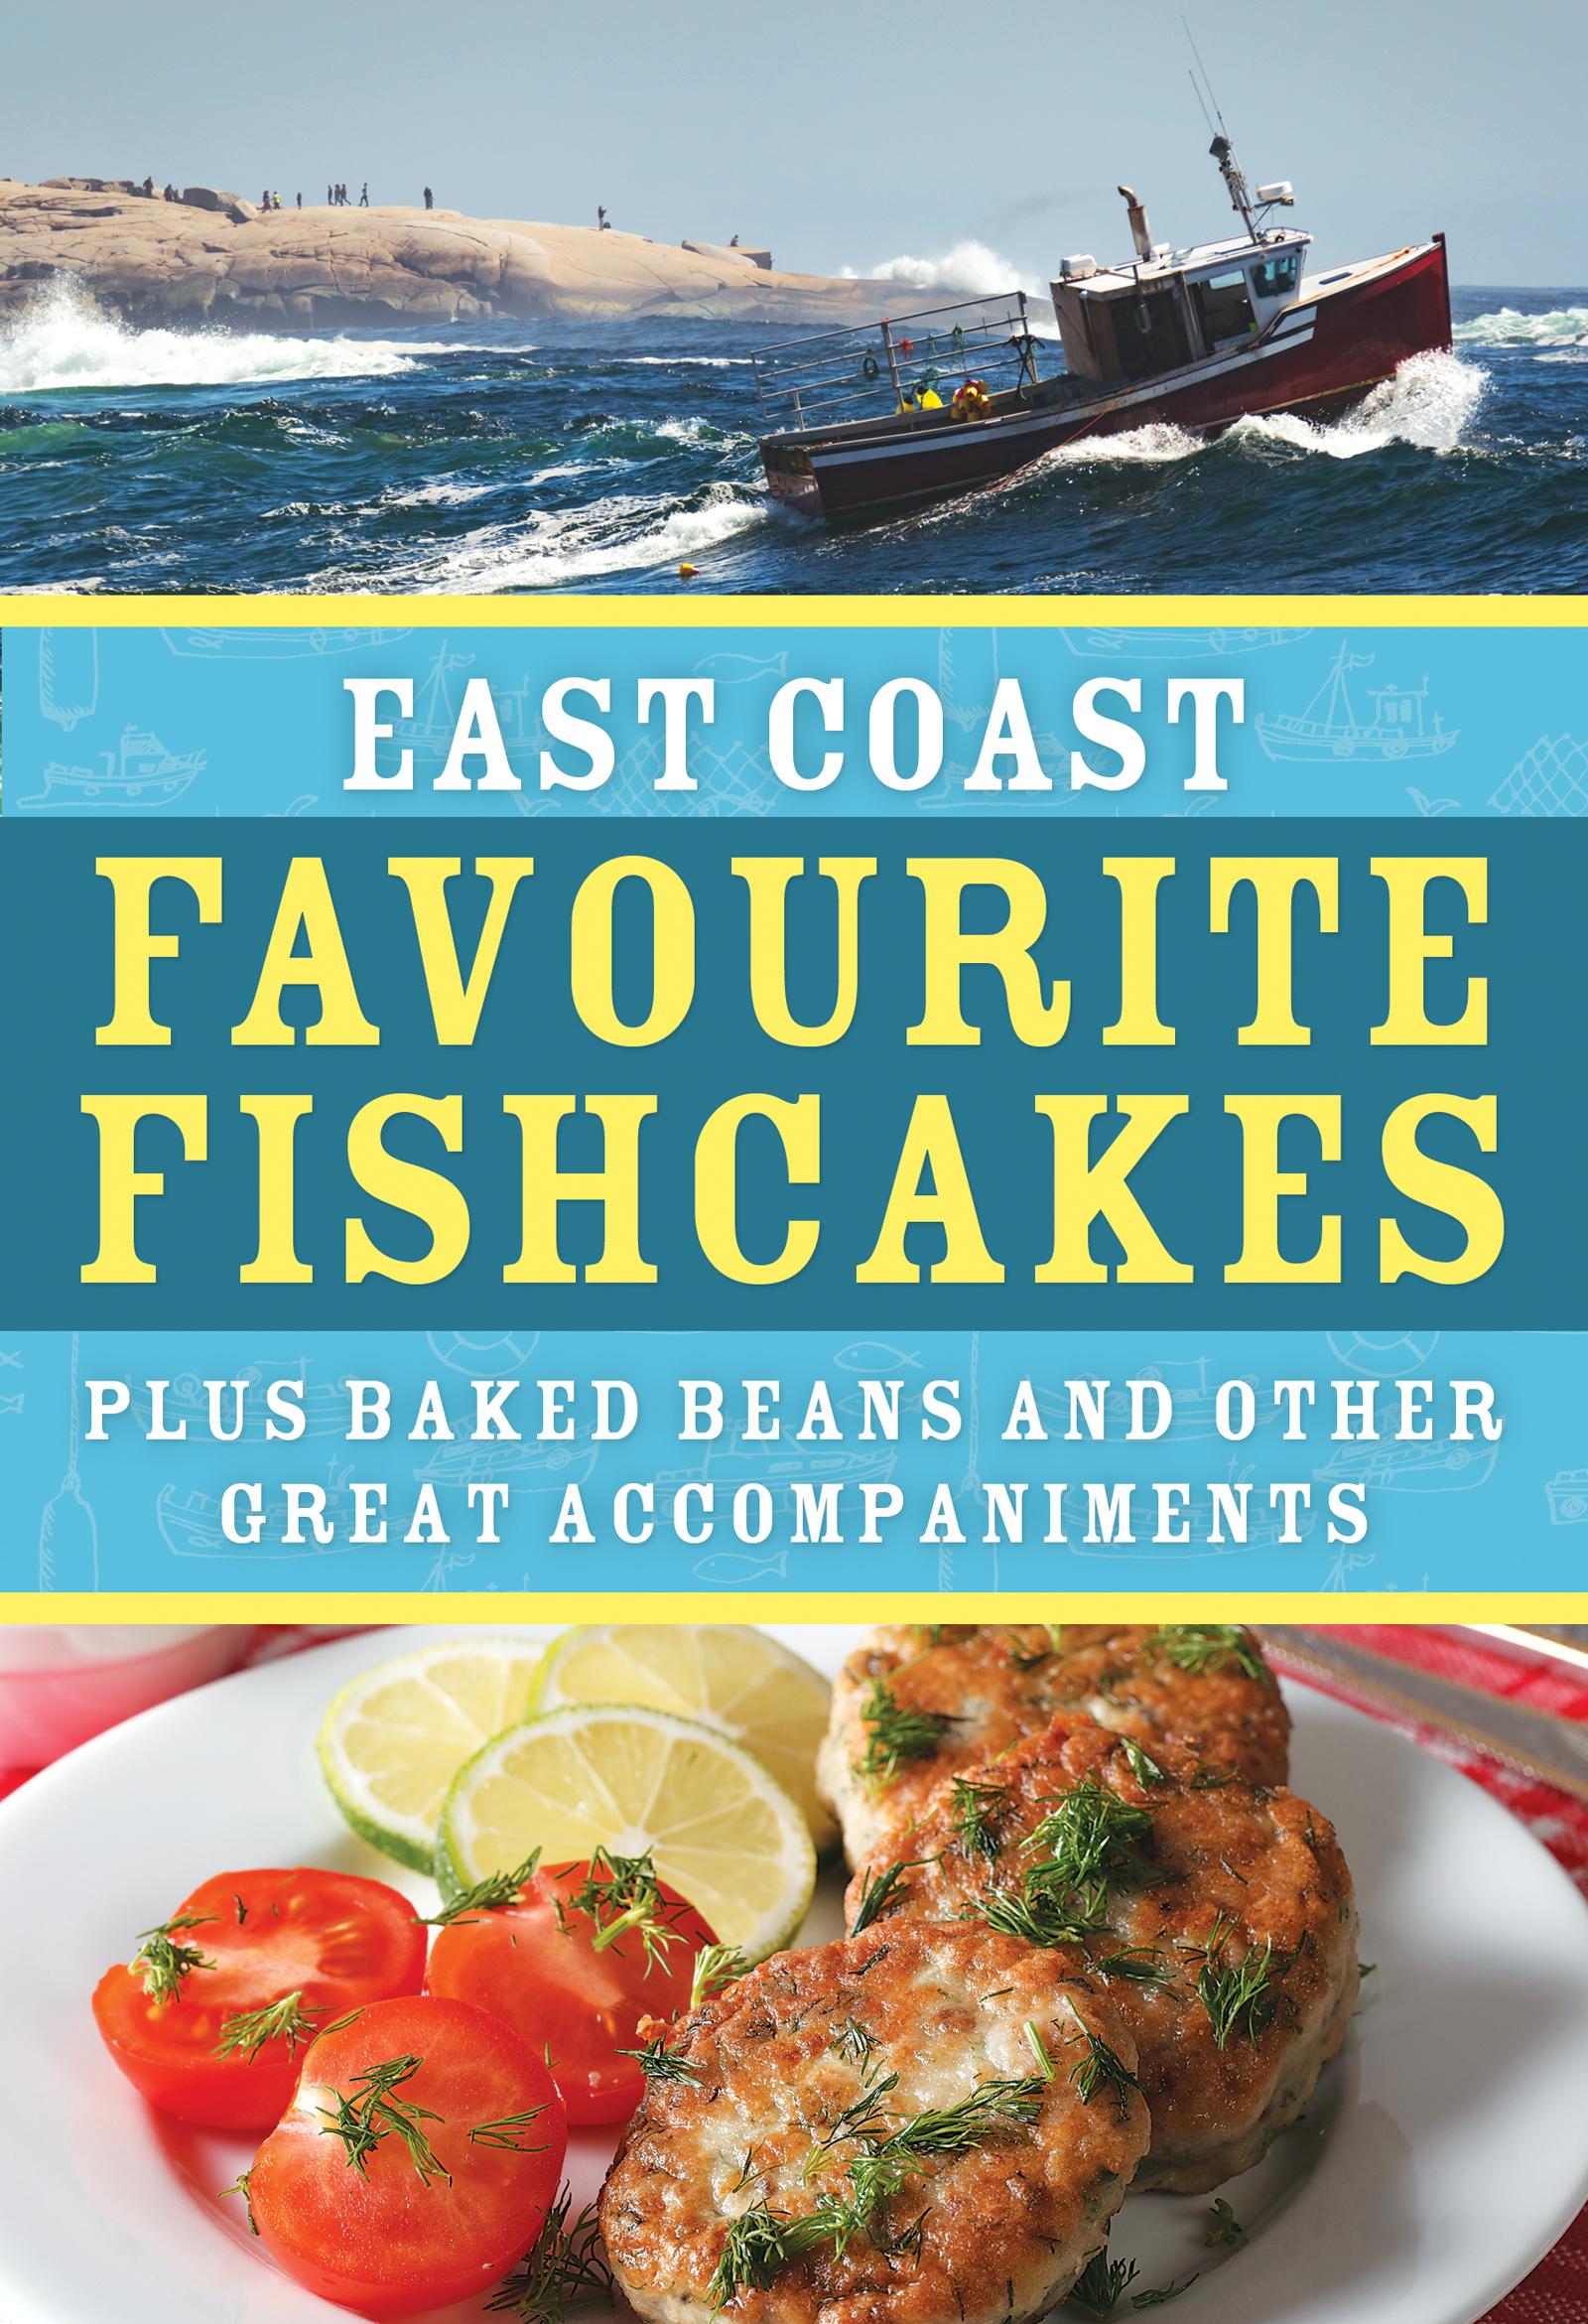 East Coast Favourite Fishcakes